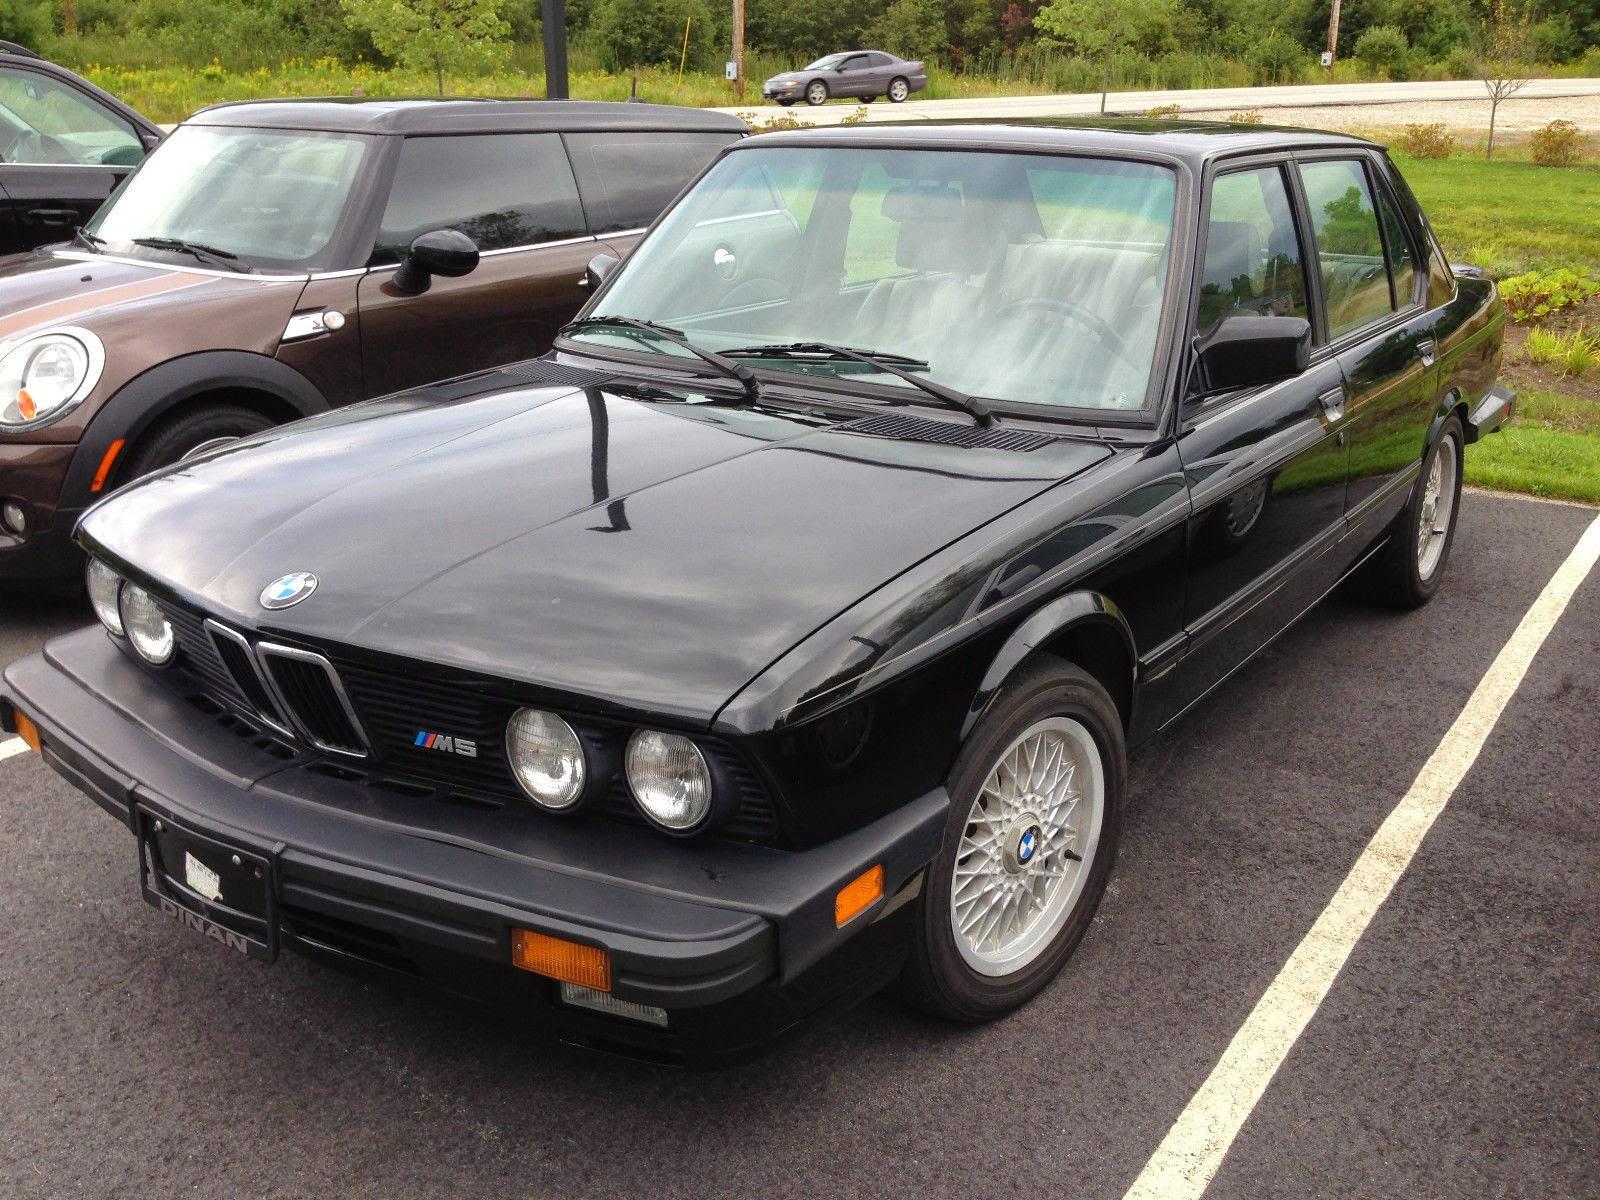 10k: Vader's Family Car: 1988 BMW M5 E28